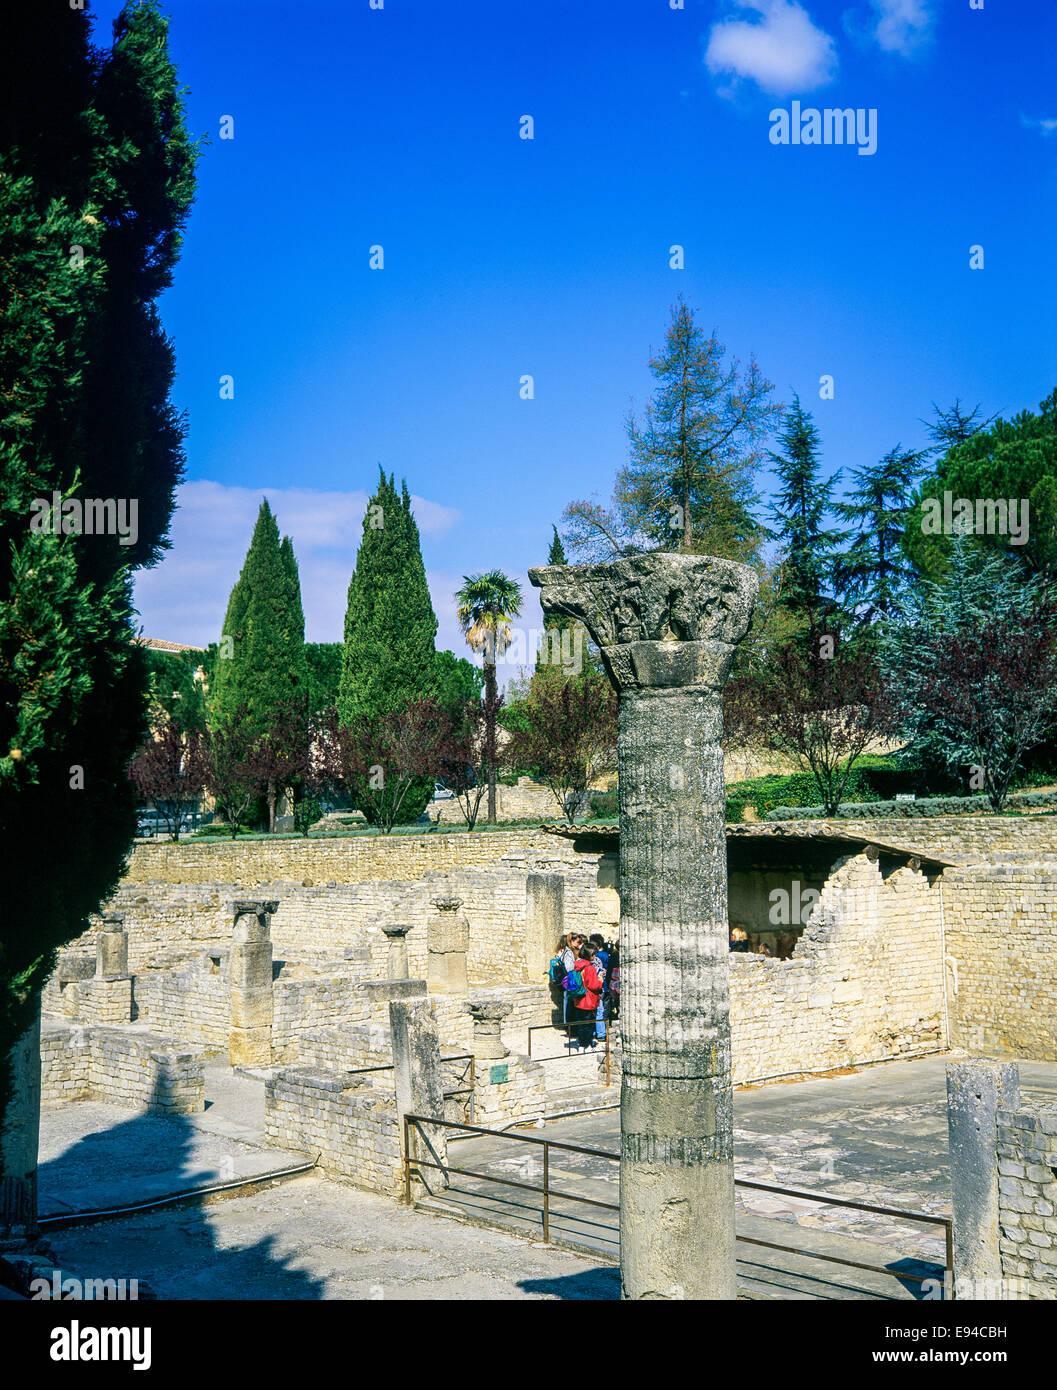 House of the Messii Puymin quarter Roman ruins Vaison-la-Romaine Provence France - Stock Image